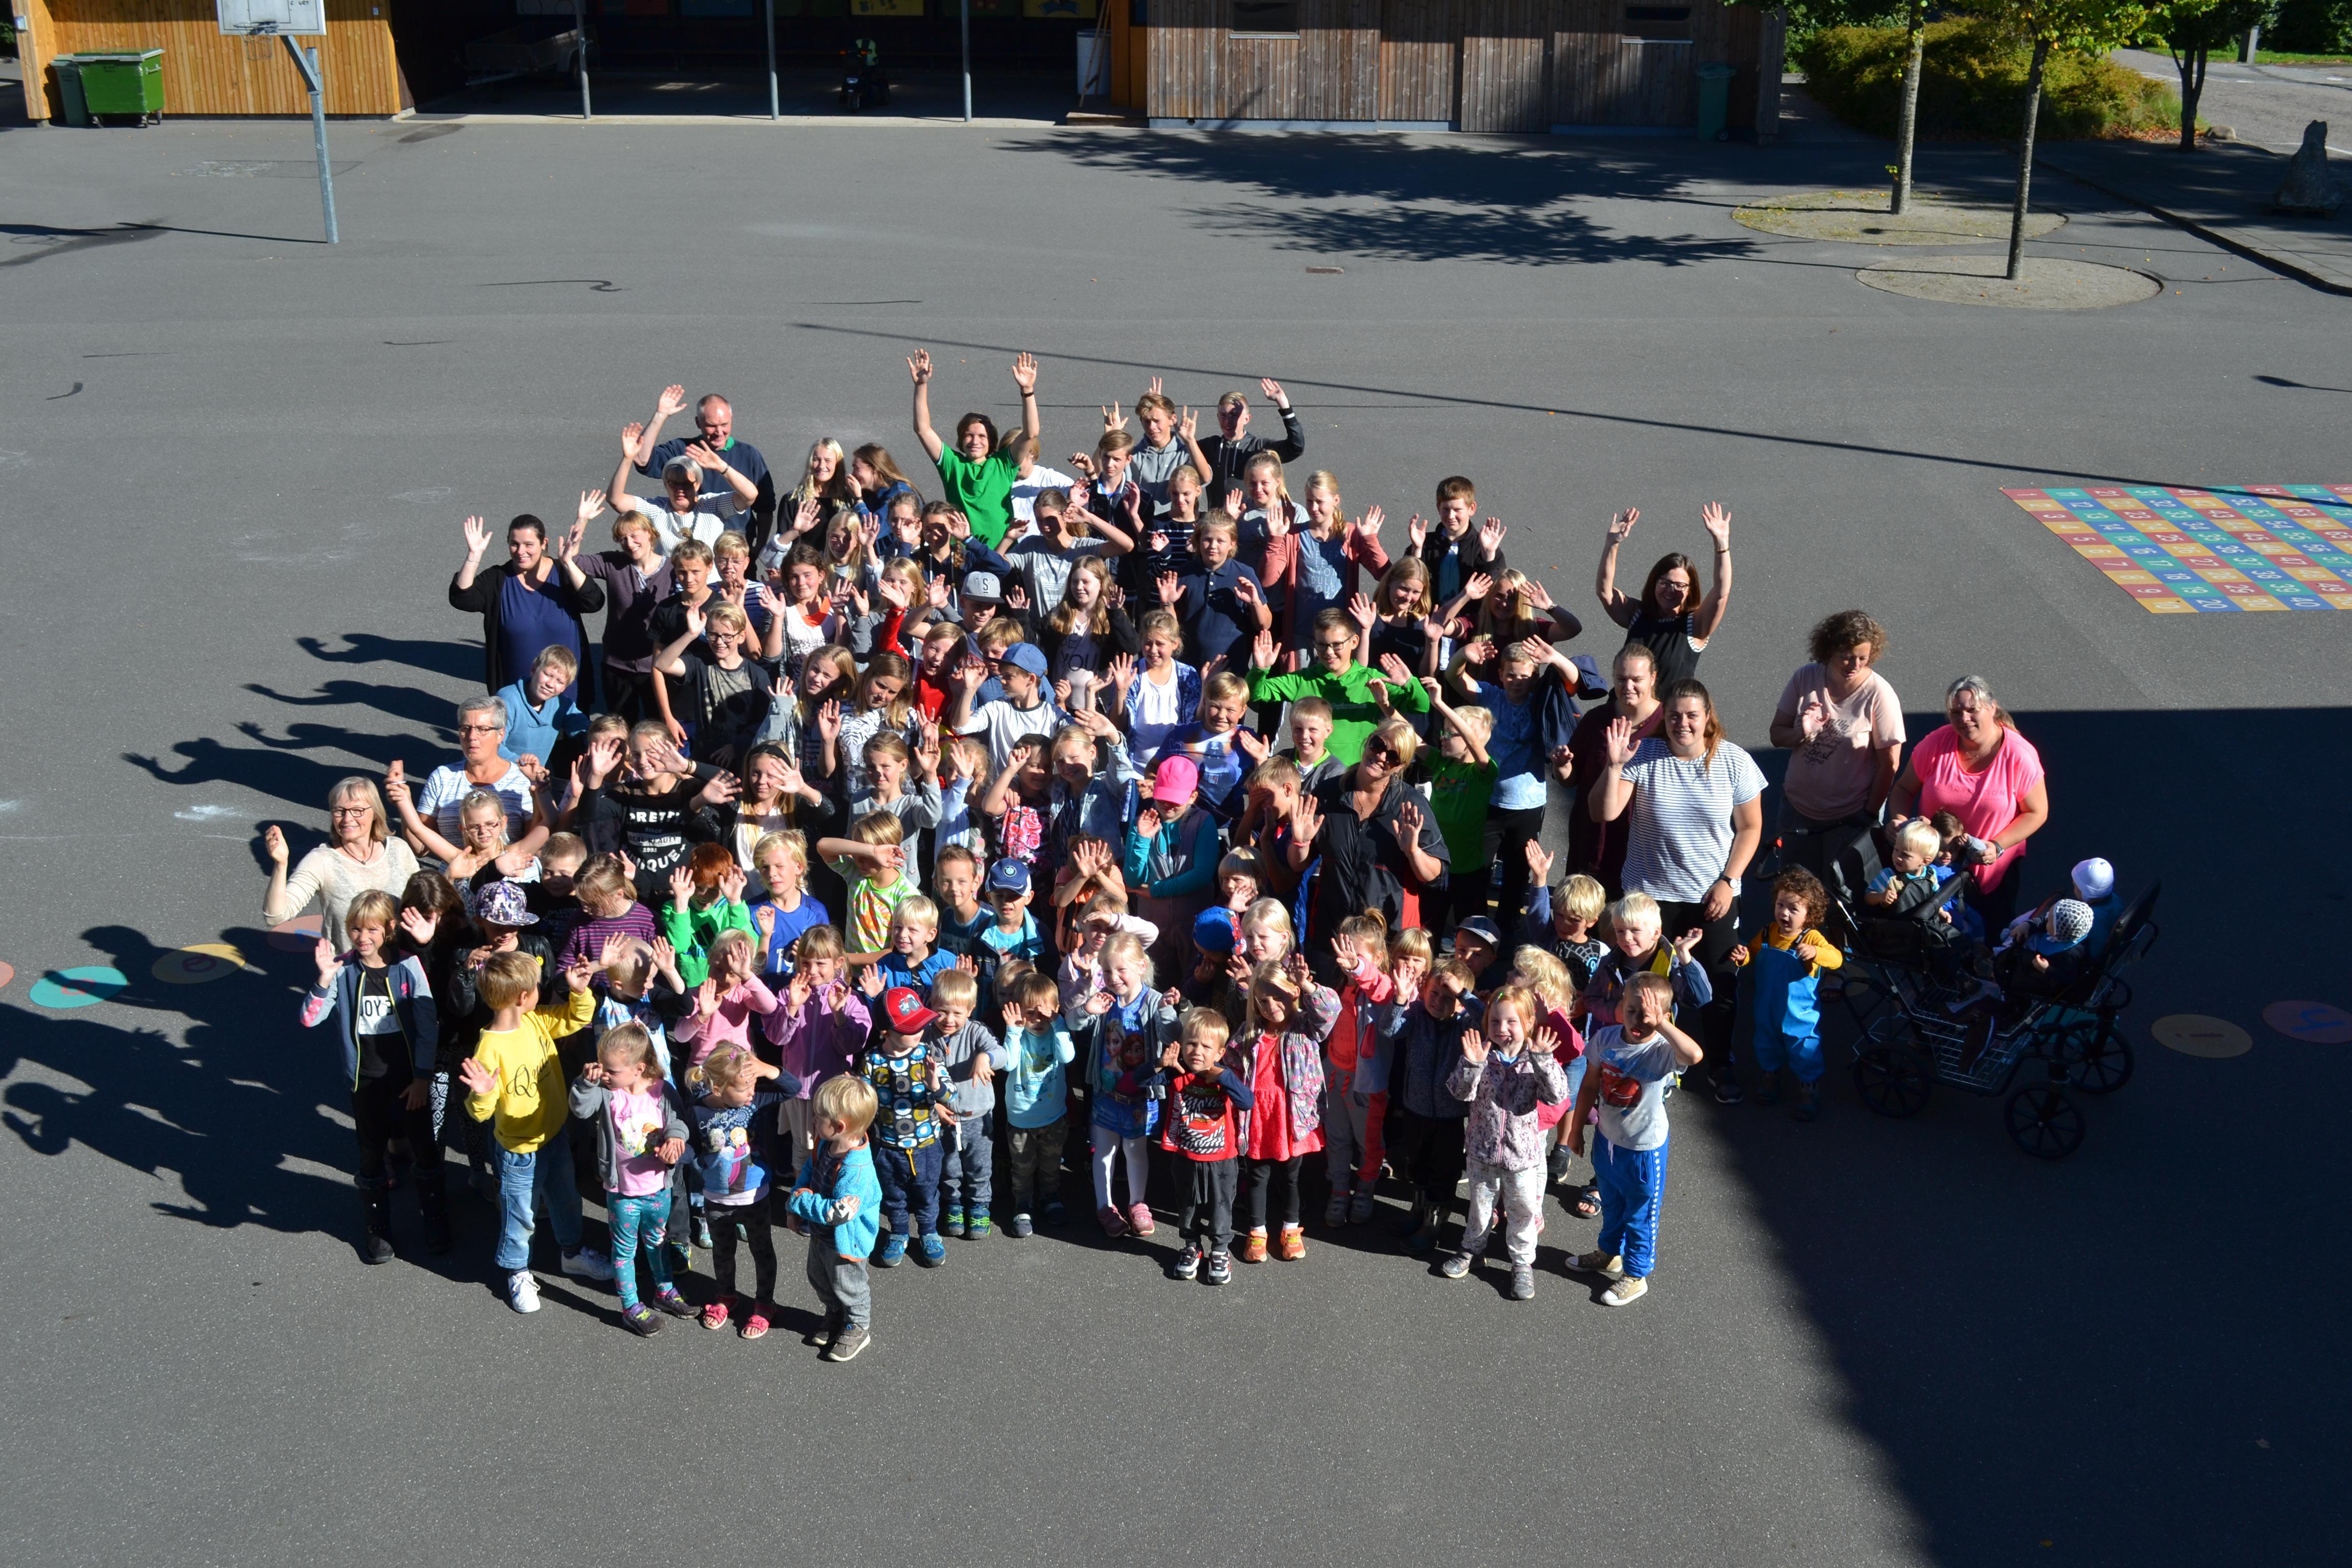 Blære Friskole og Børnehuset Boblen September 2016